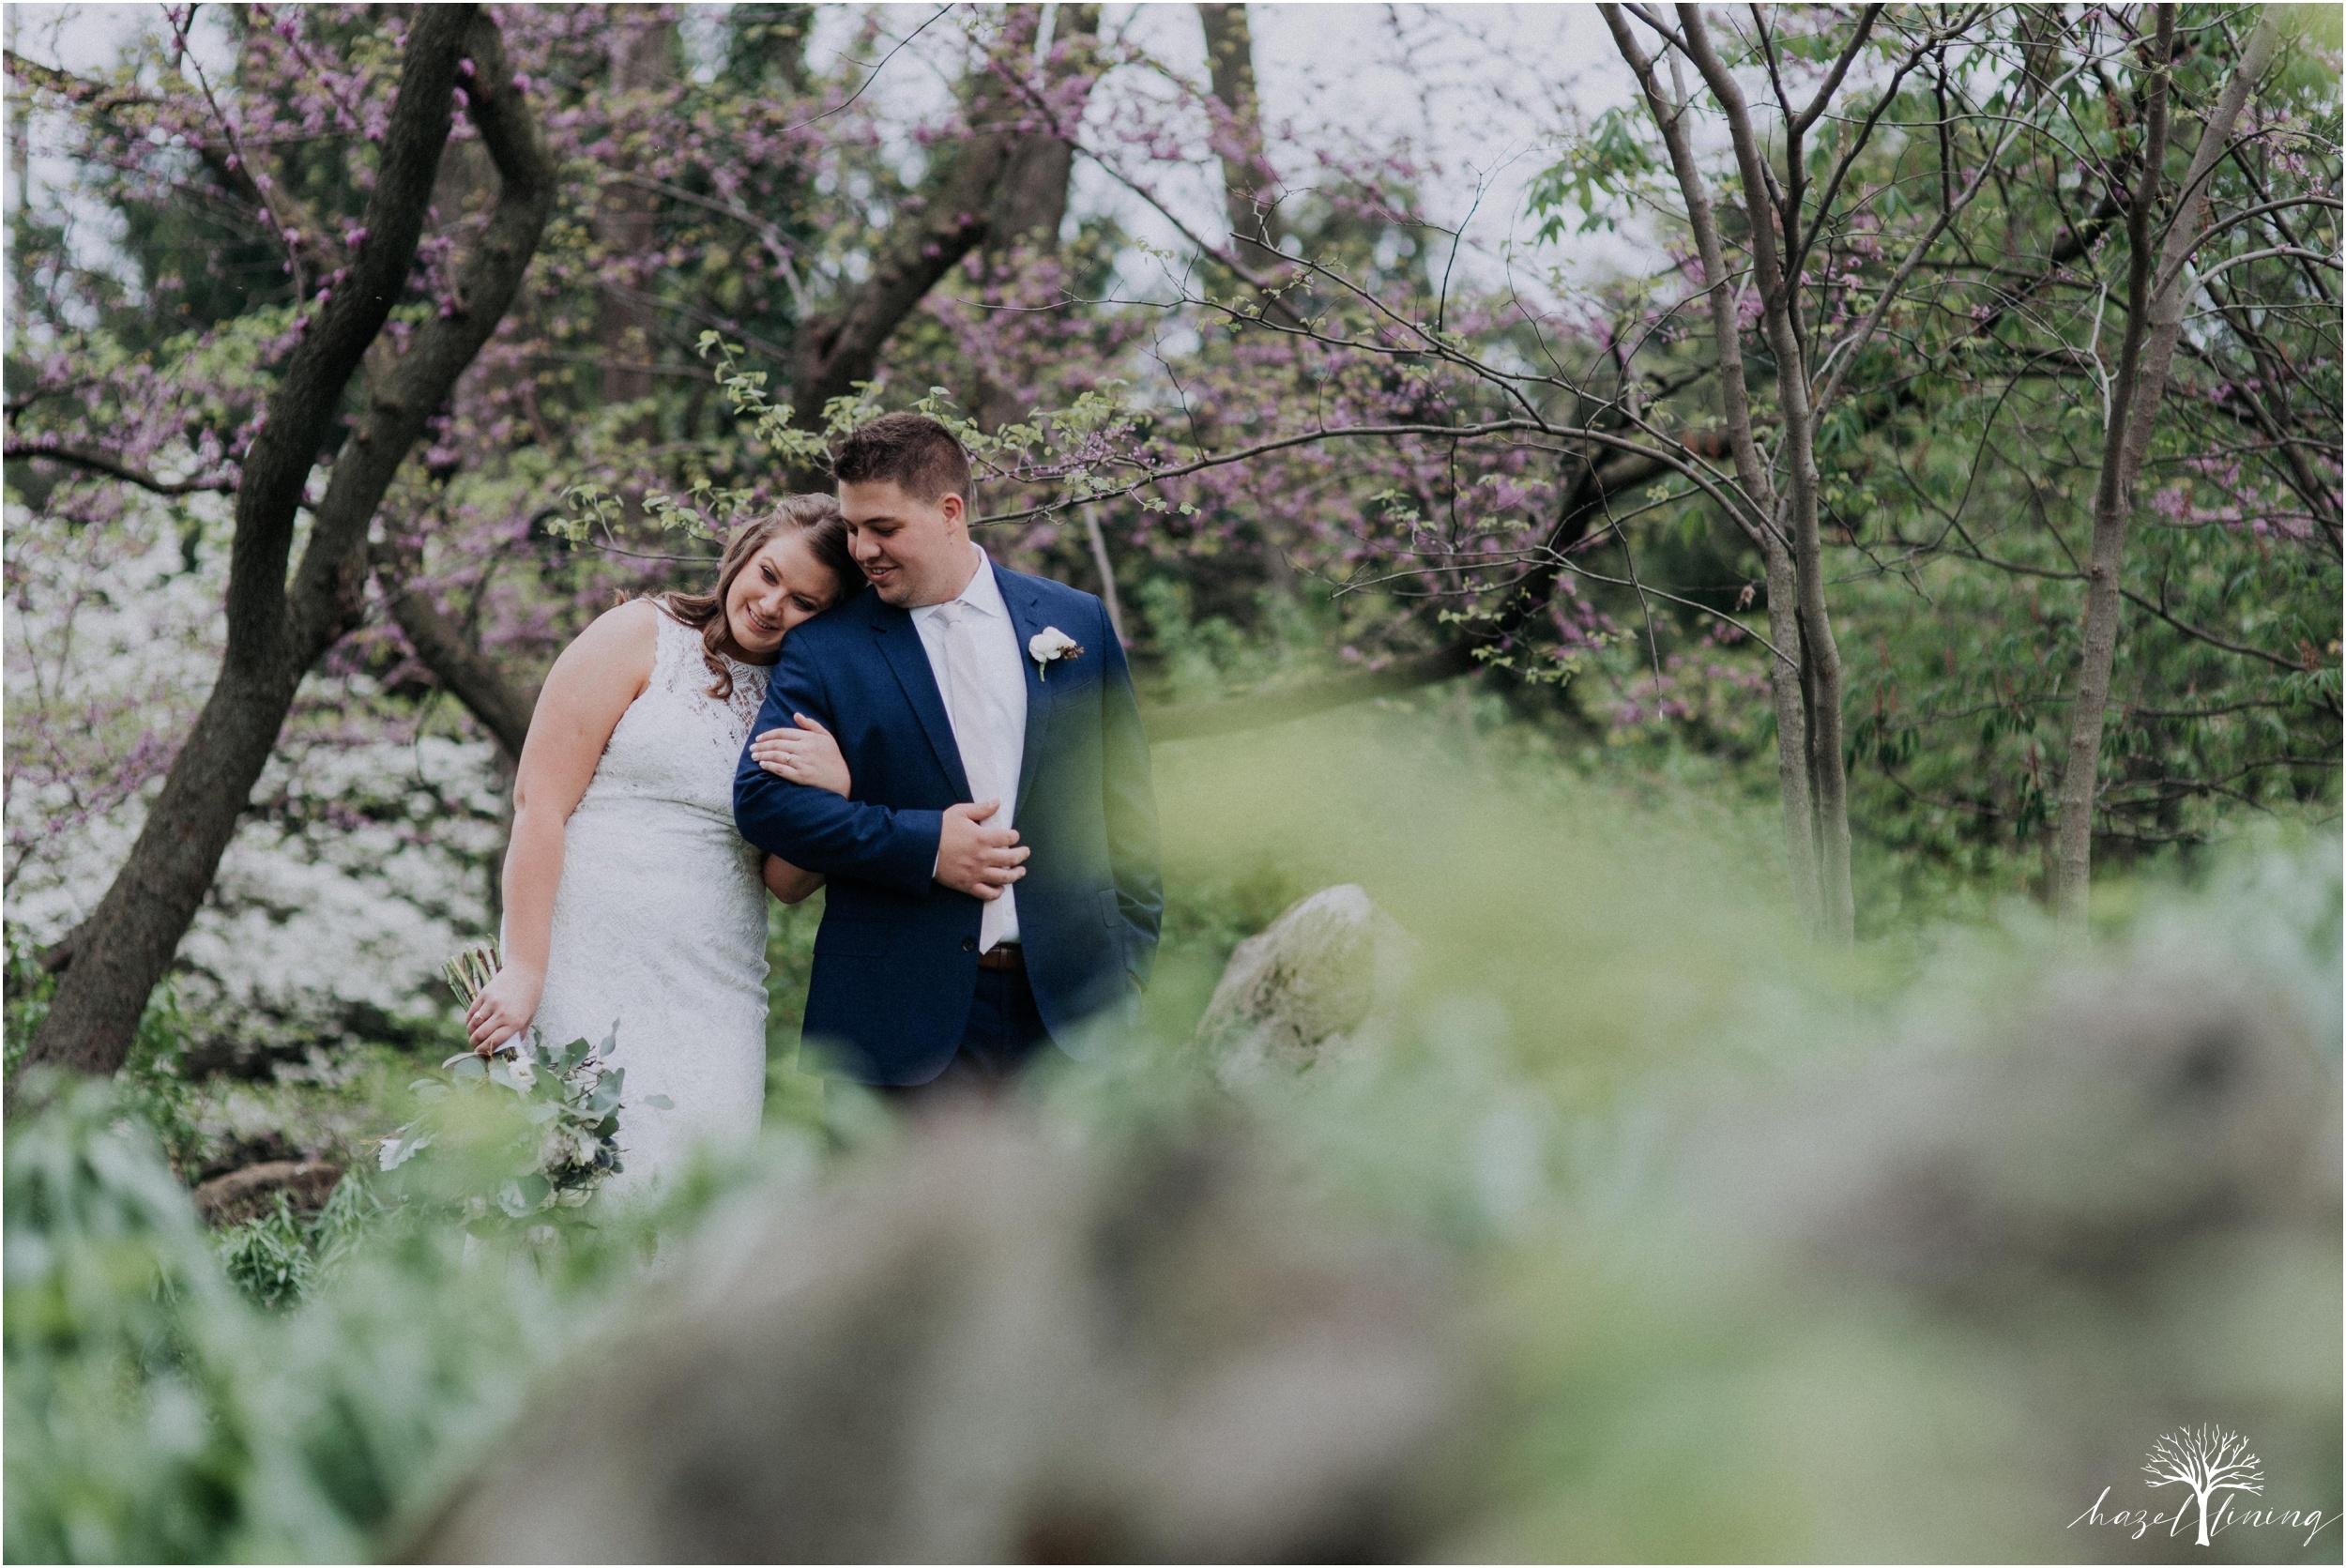 hazel-lining-travel-wedding-elopement-photography-abby-skyler-hunt-the-willis-house-york-pennsylvania-outdoor-estate-wedding_0033.jpg